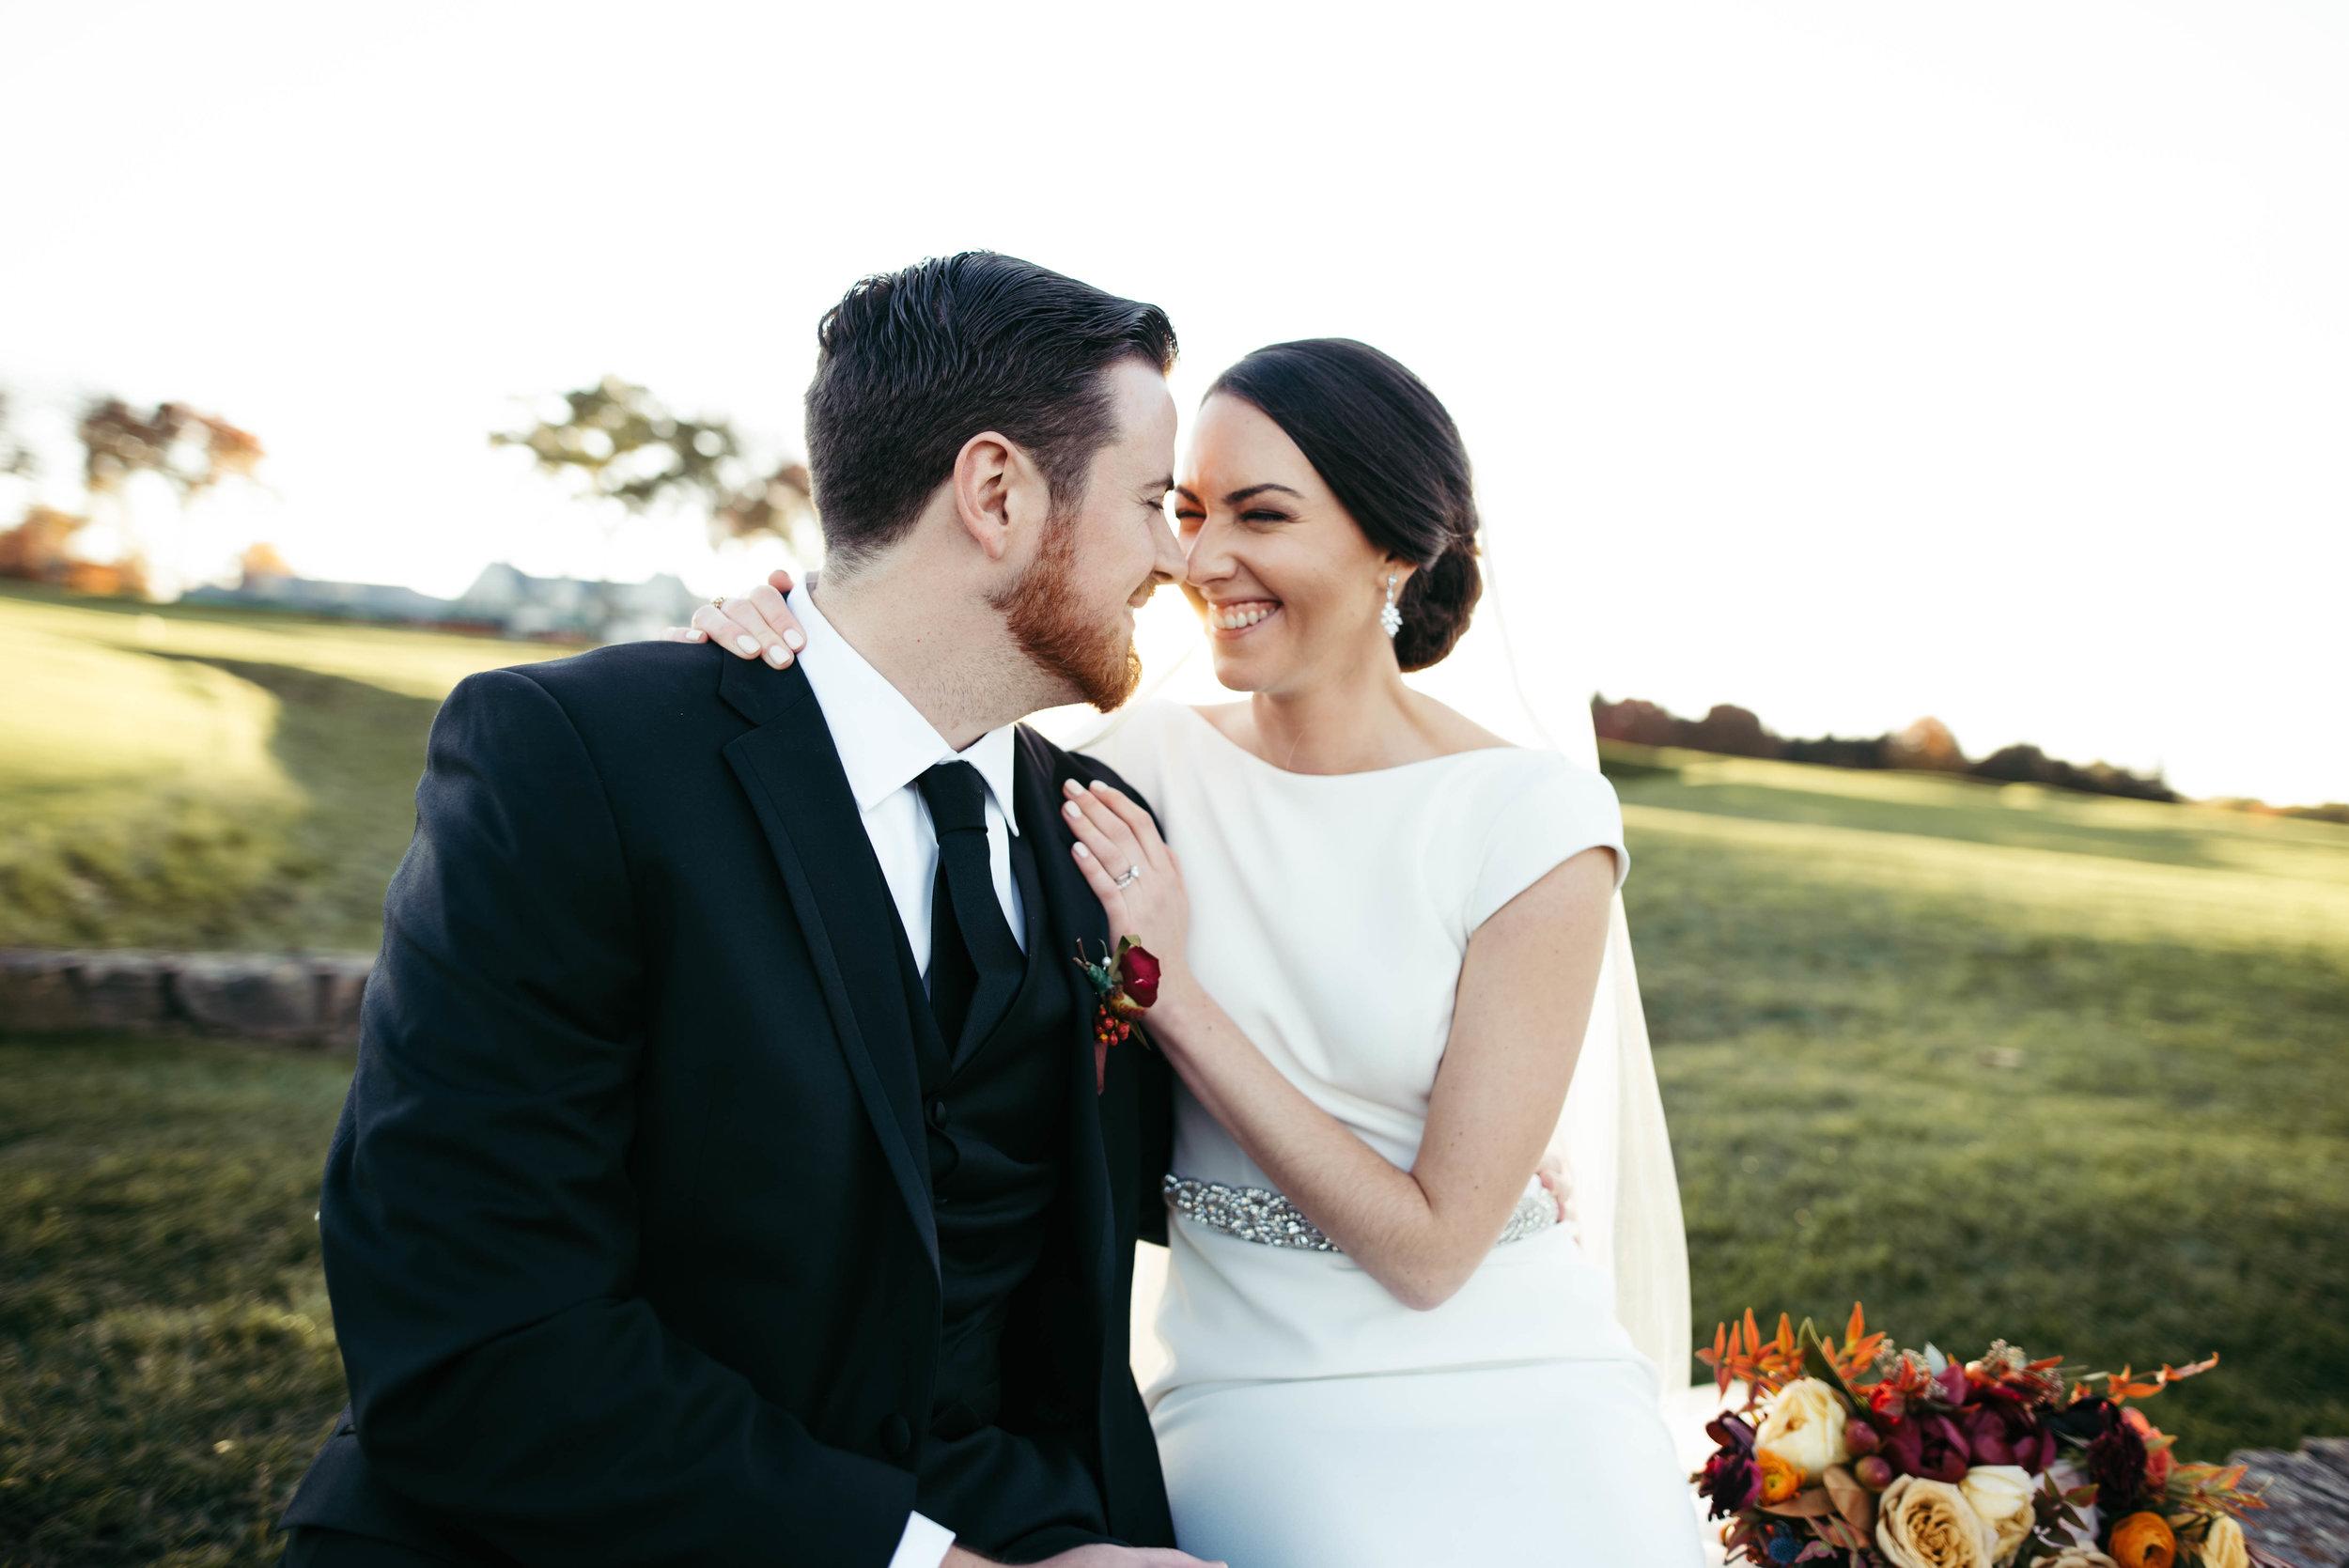 oakmont country club wedding-29.jpg